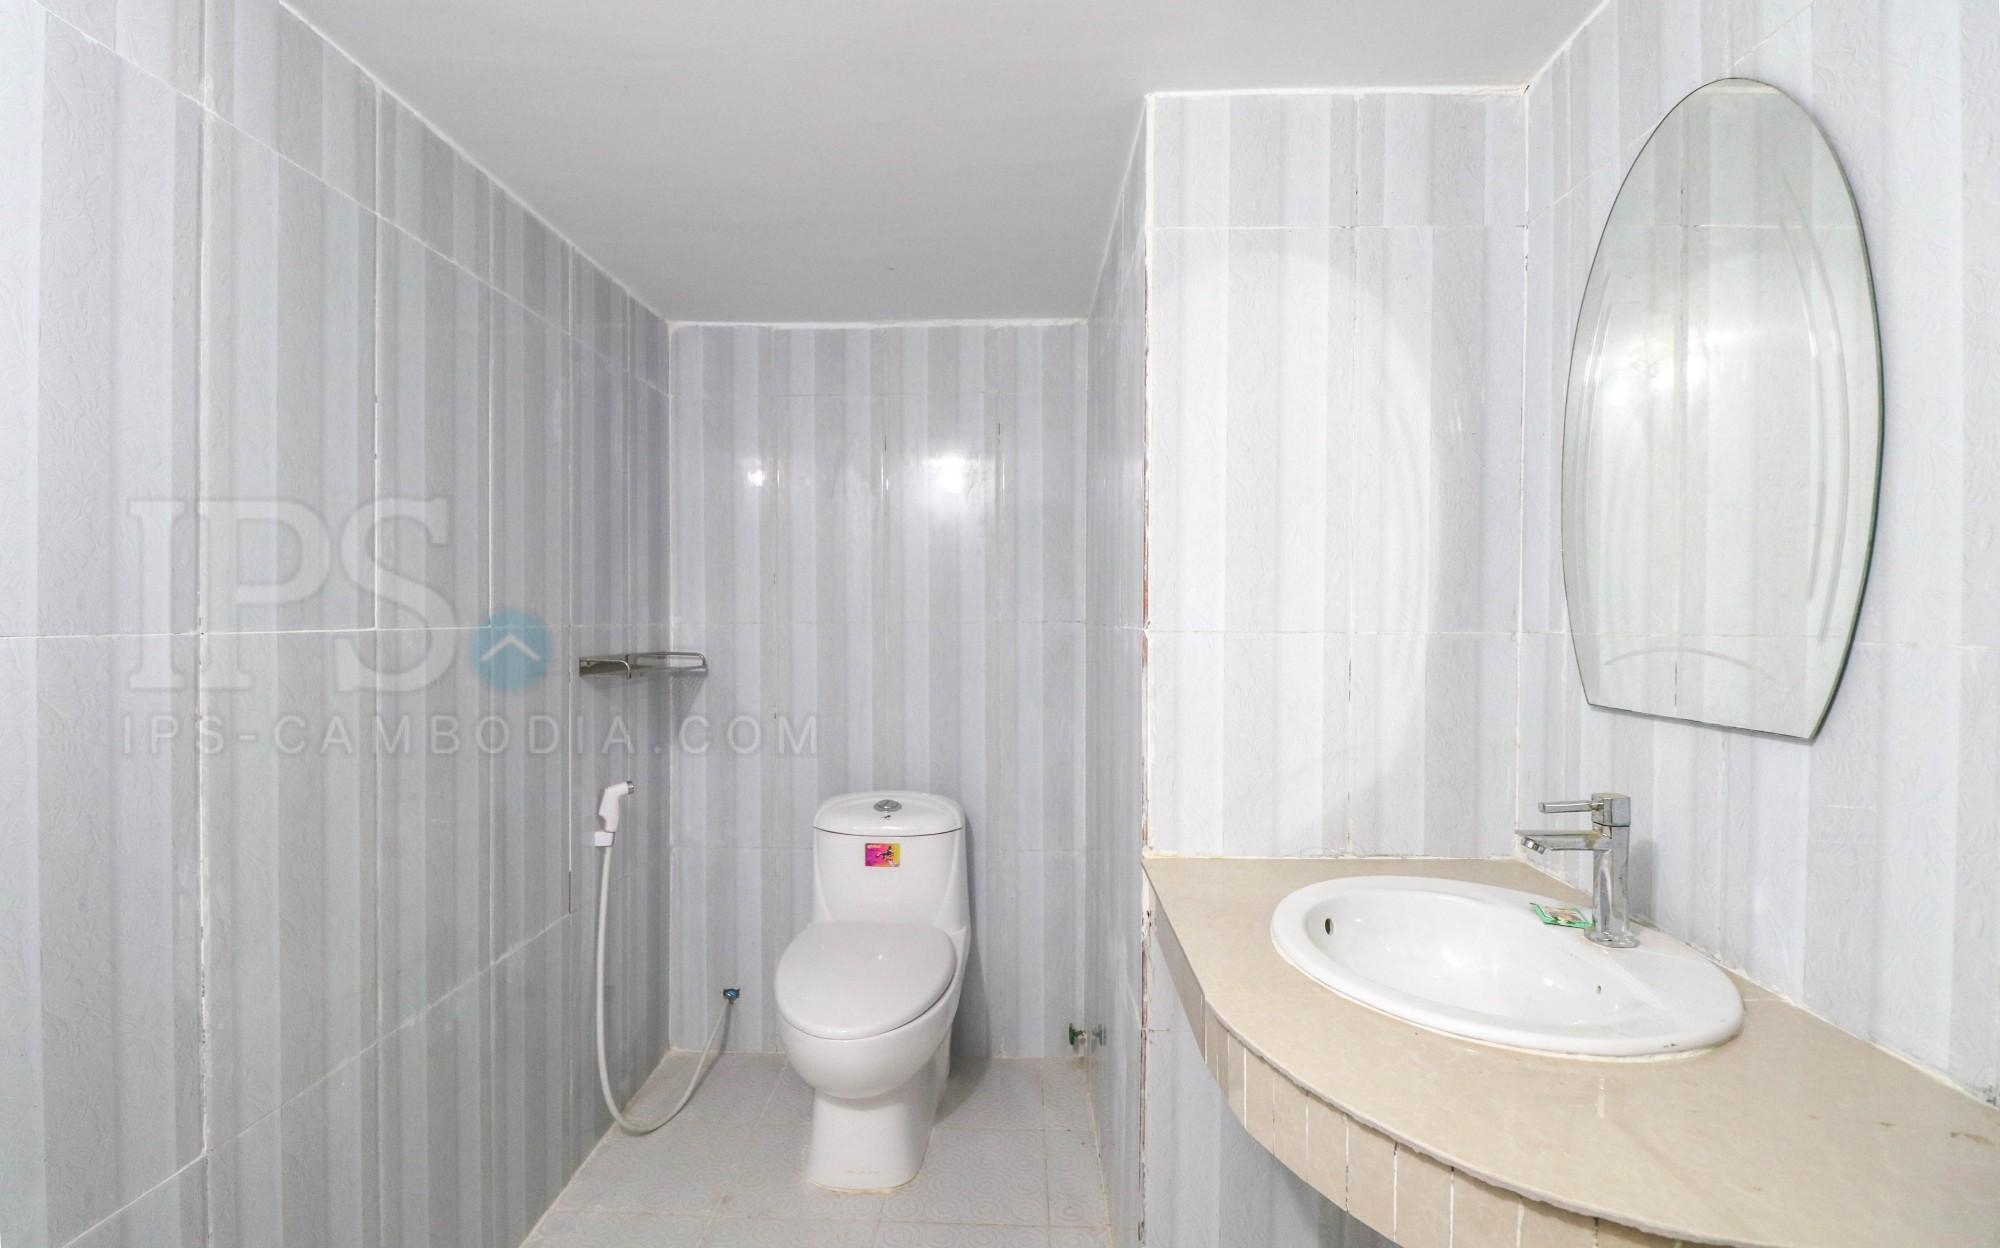 4 Bedroom House For Rent - Mittapheap, Sihanoukville